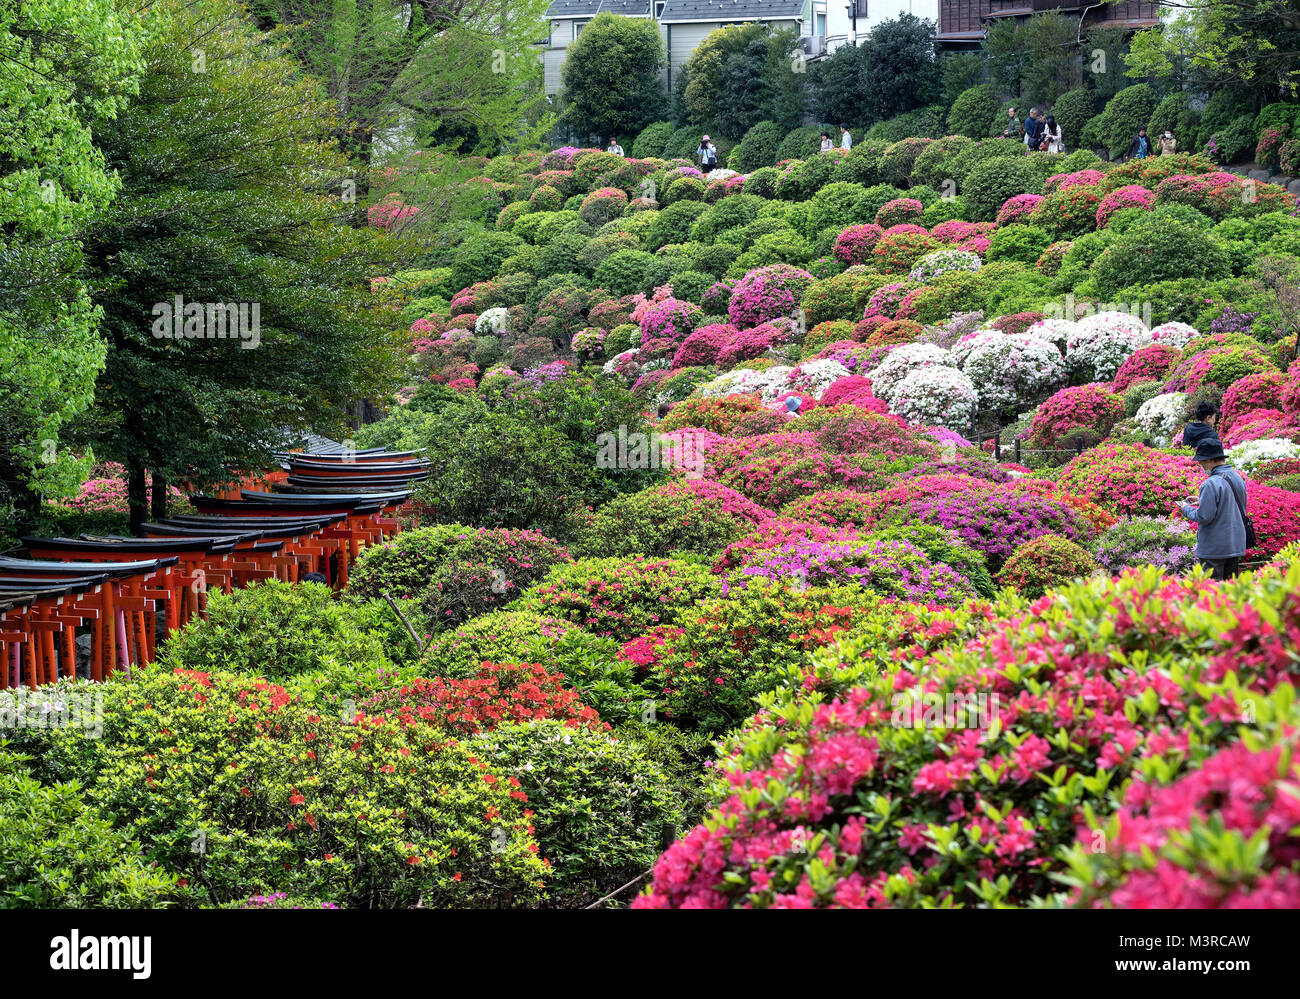 Japan, Honshu island, Kanto, Tokyo, azalea festival at Nezu jinja shrine. - Stock Image